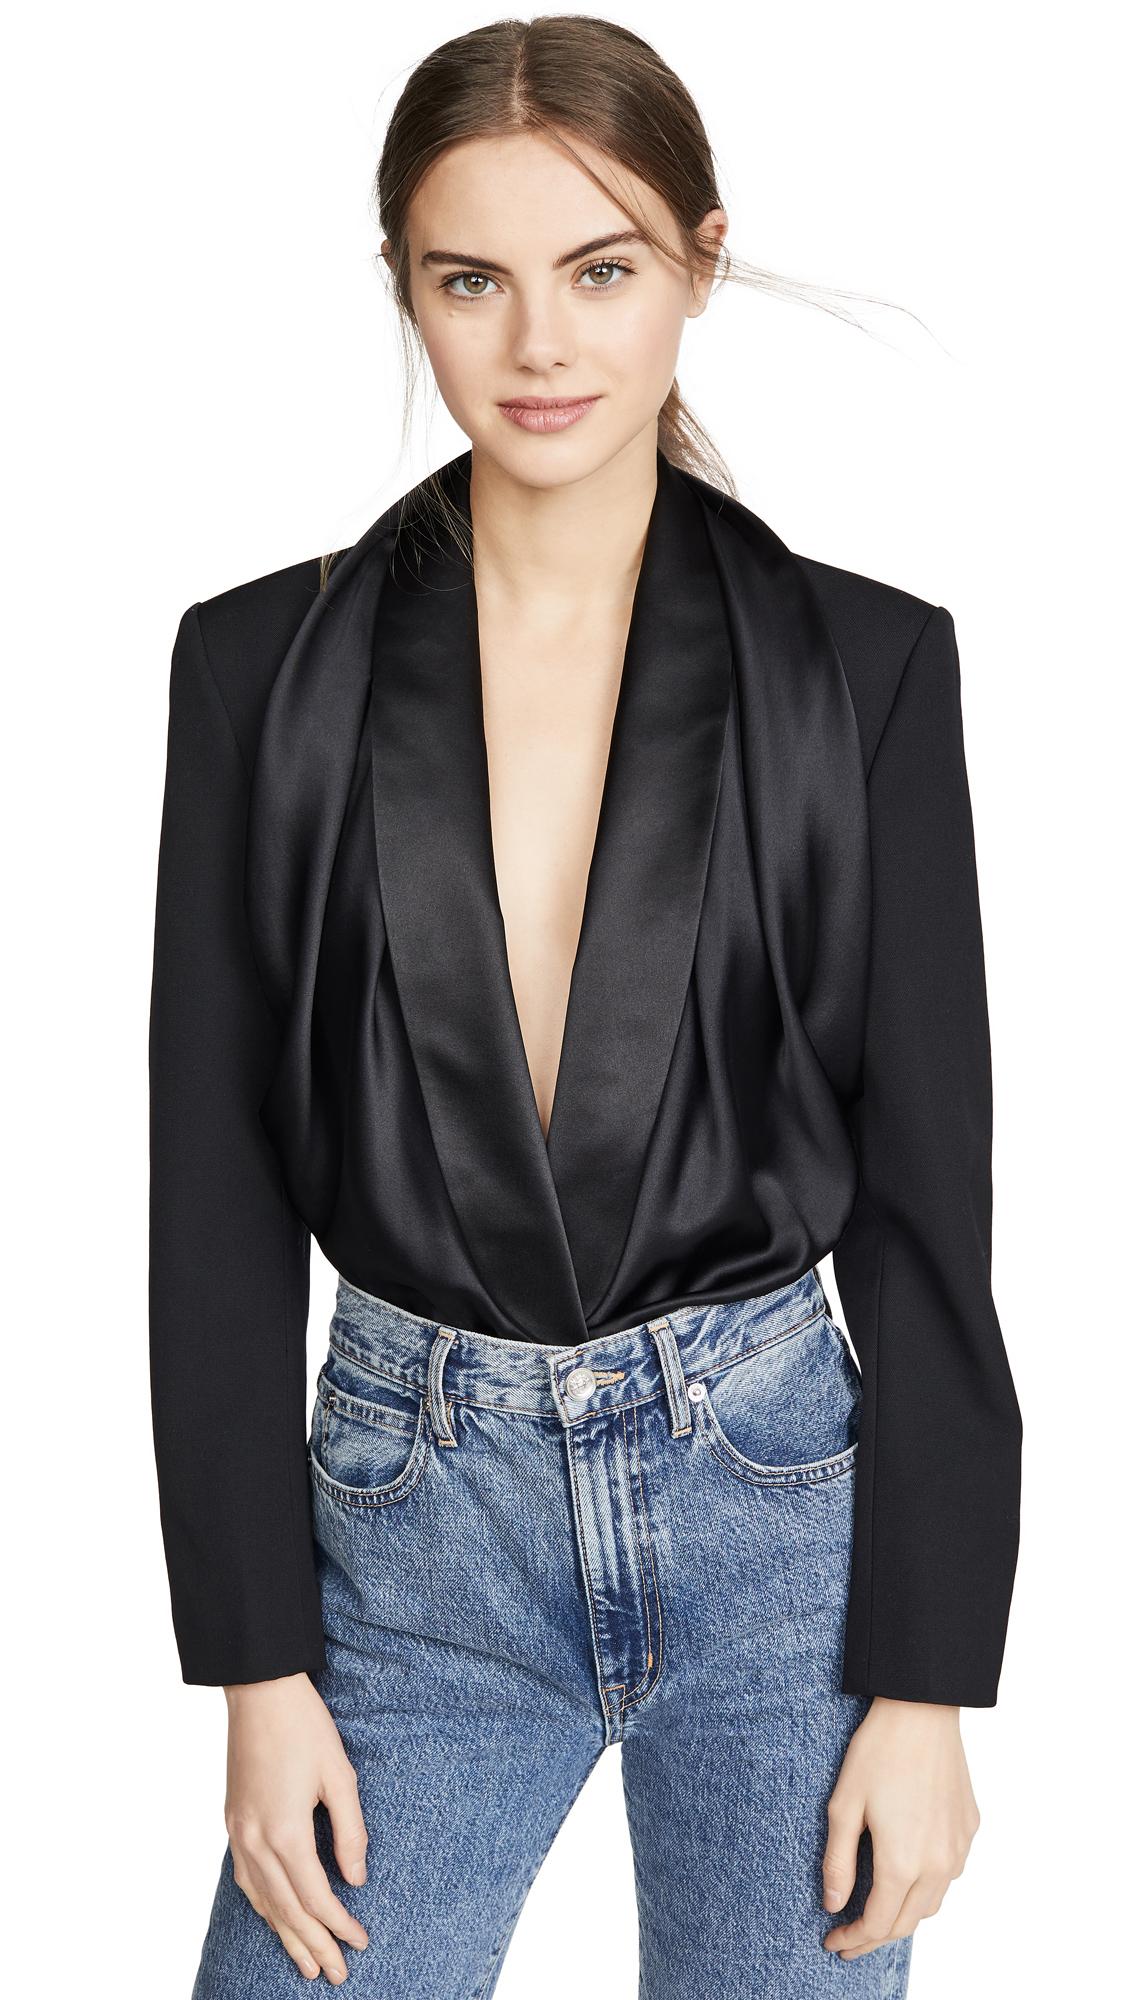 Alexander Wang Blazer Hybrid Bodysuit – 50% Off Sale